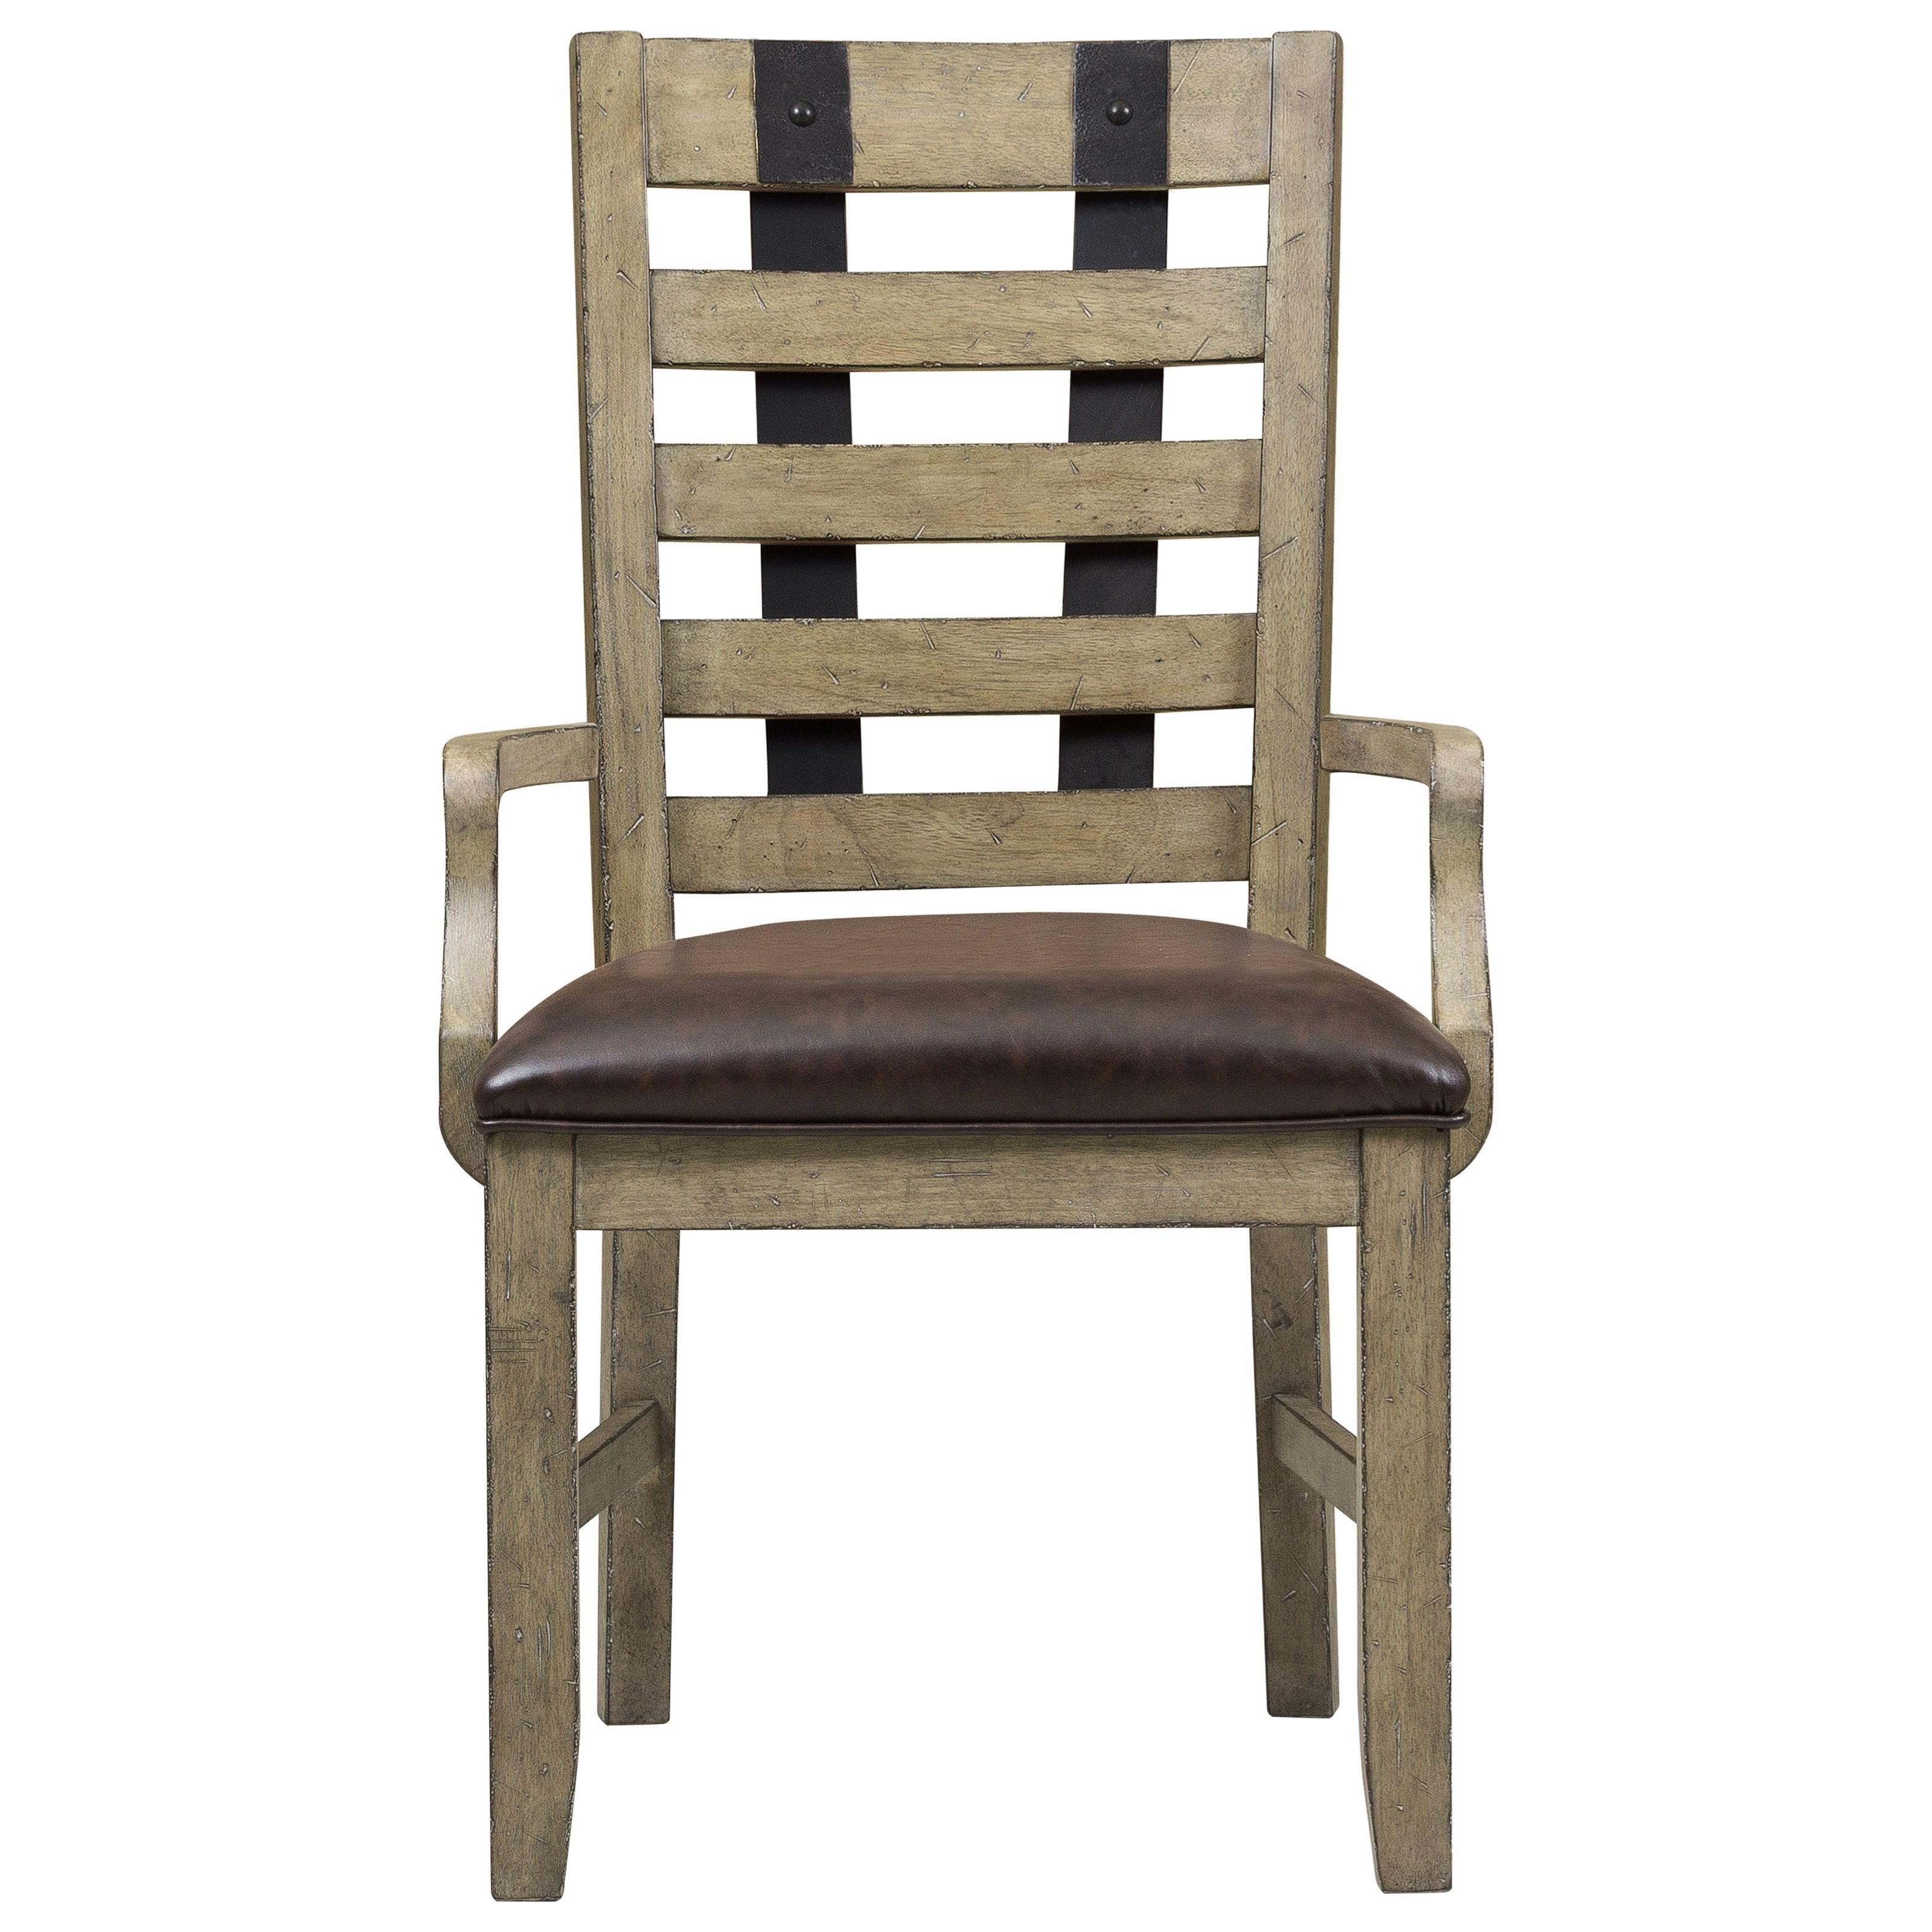 Metal Strap Arm Chair